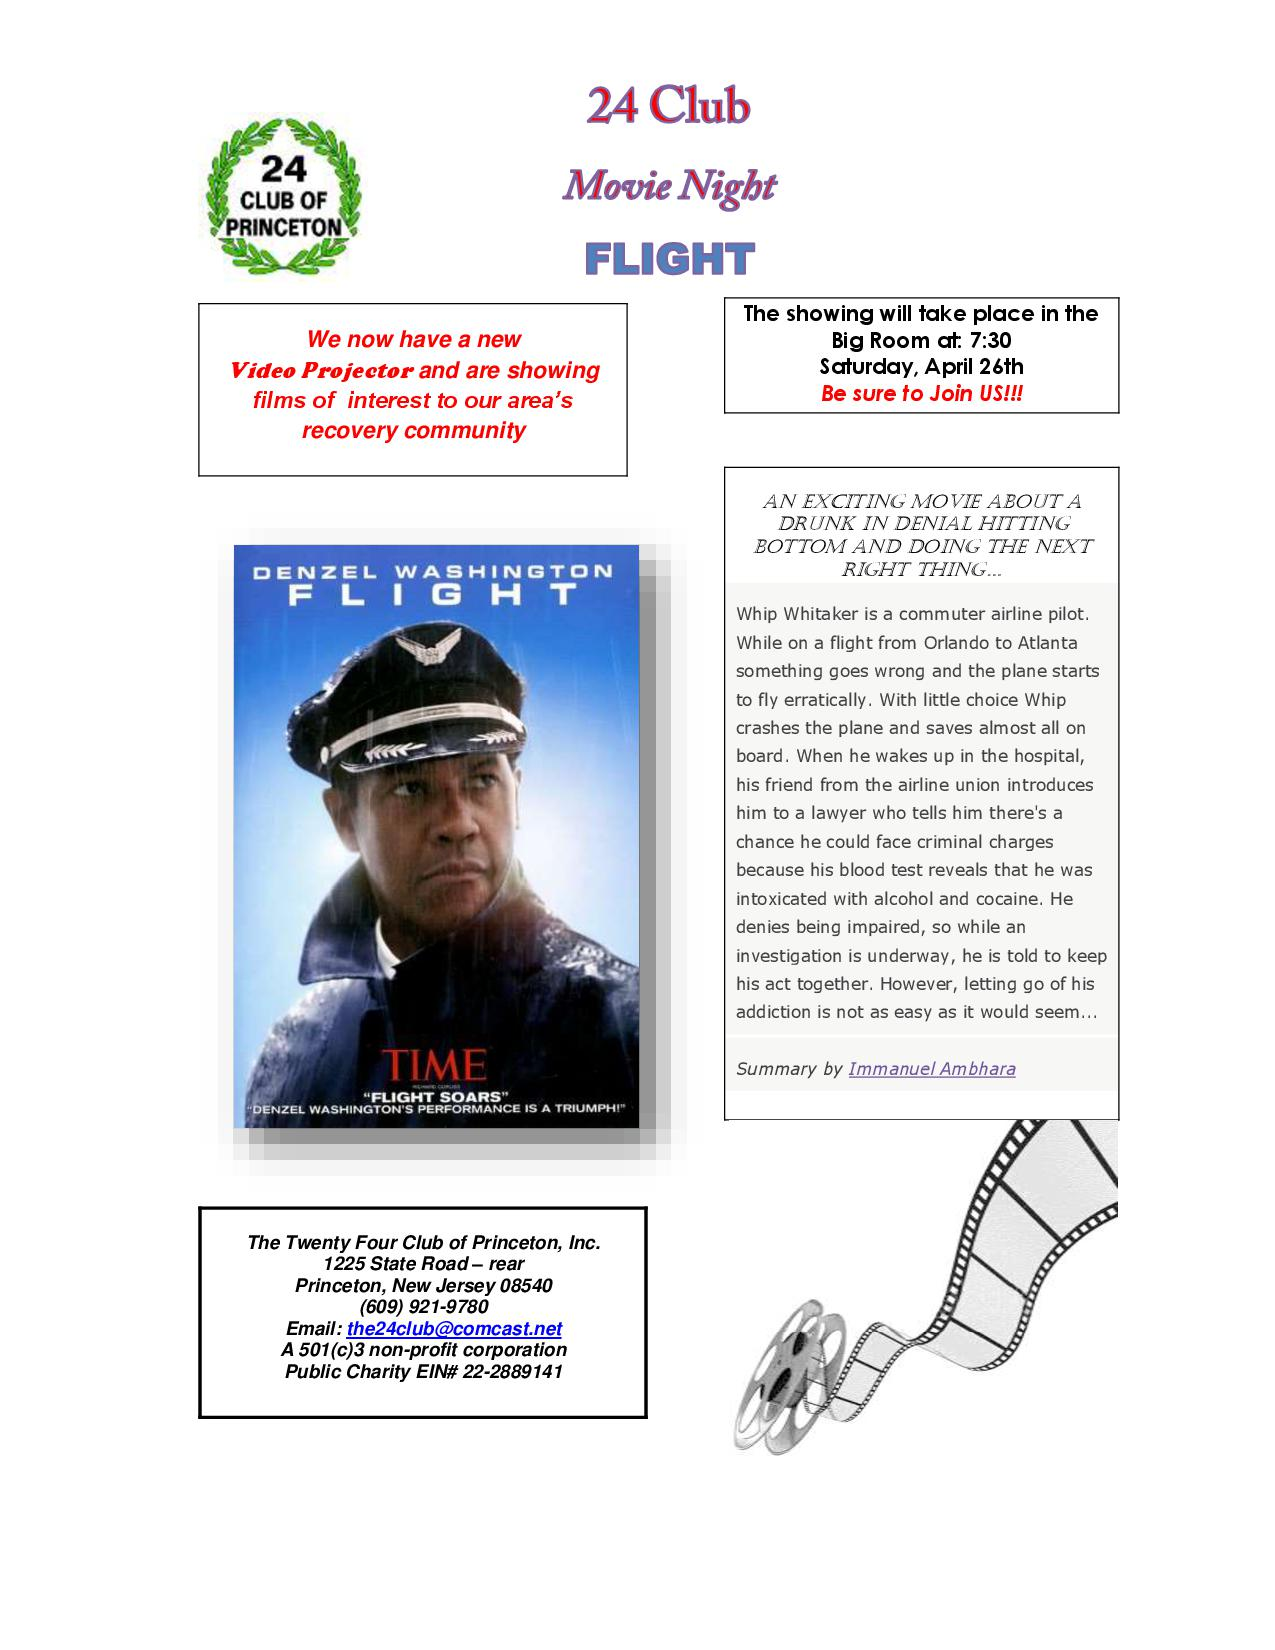 Movie Nite Flyer - FLIGHT 4-26-14